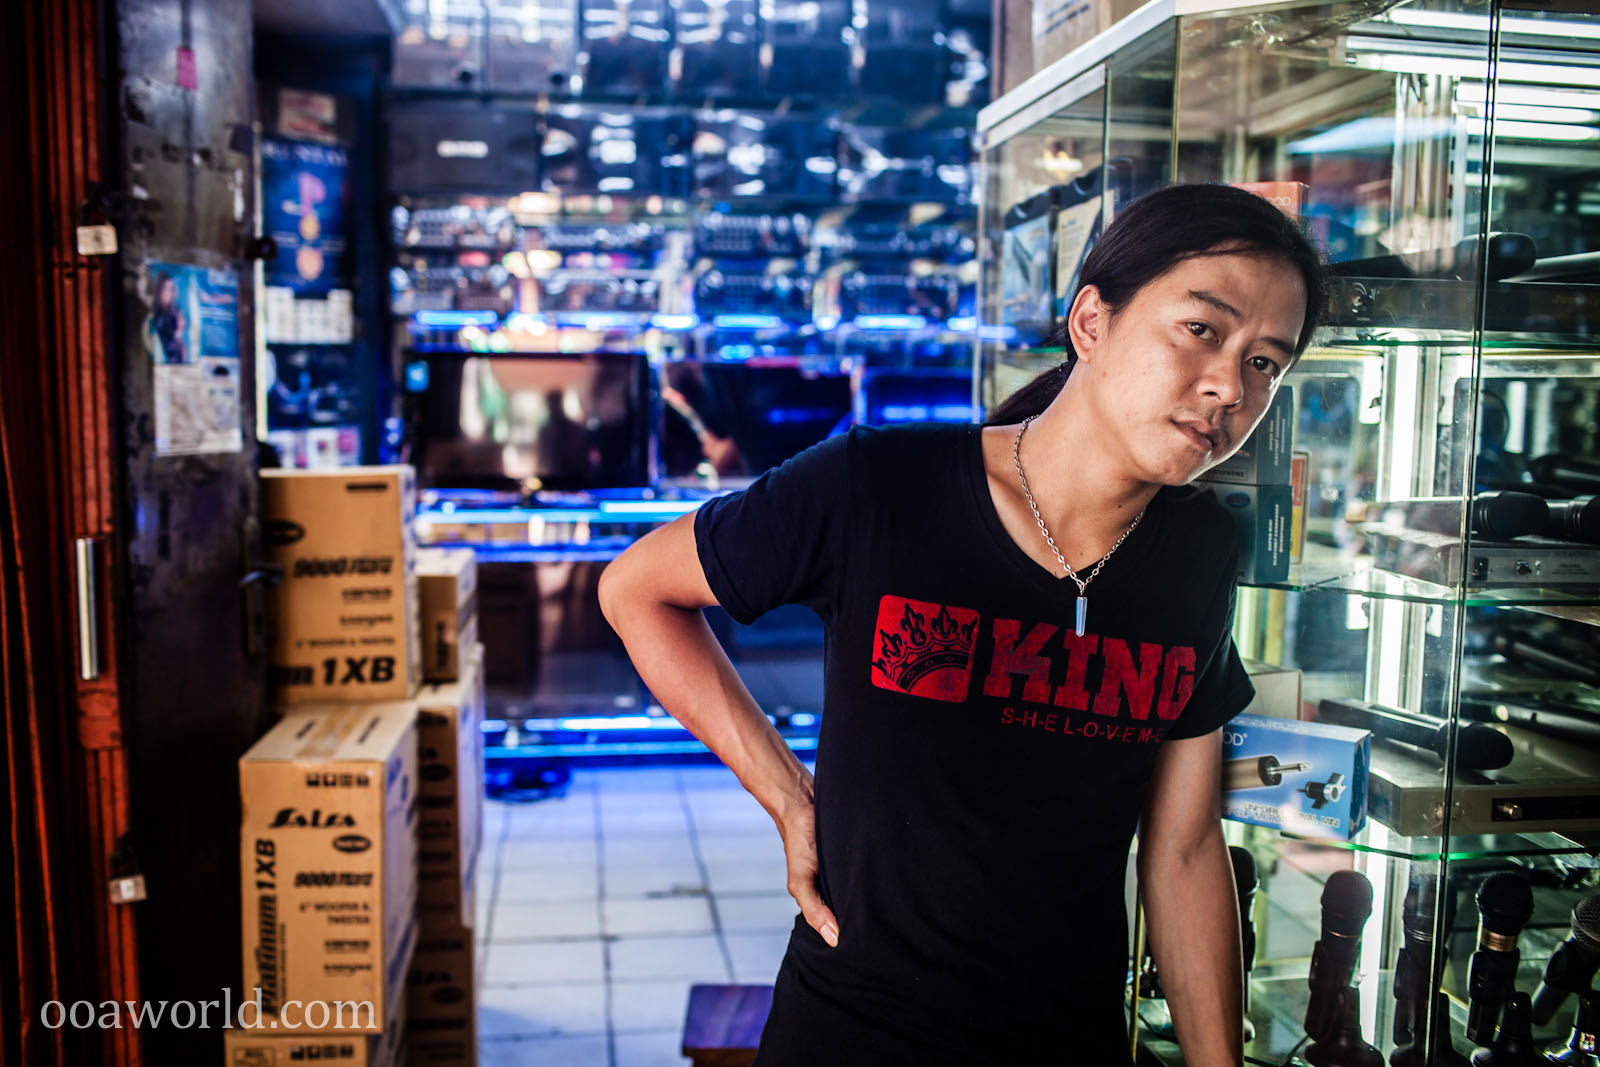 Portrait Electronic Shopkeeper Jakarta Photo Ooaworld